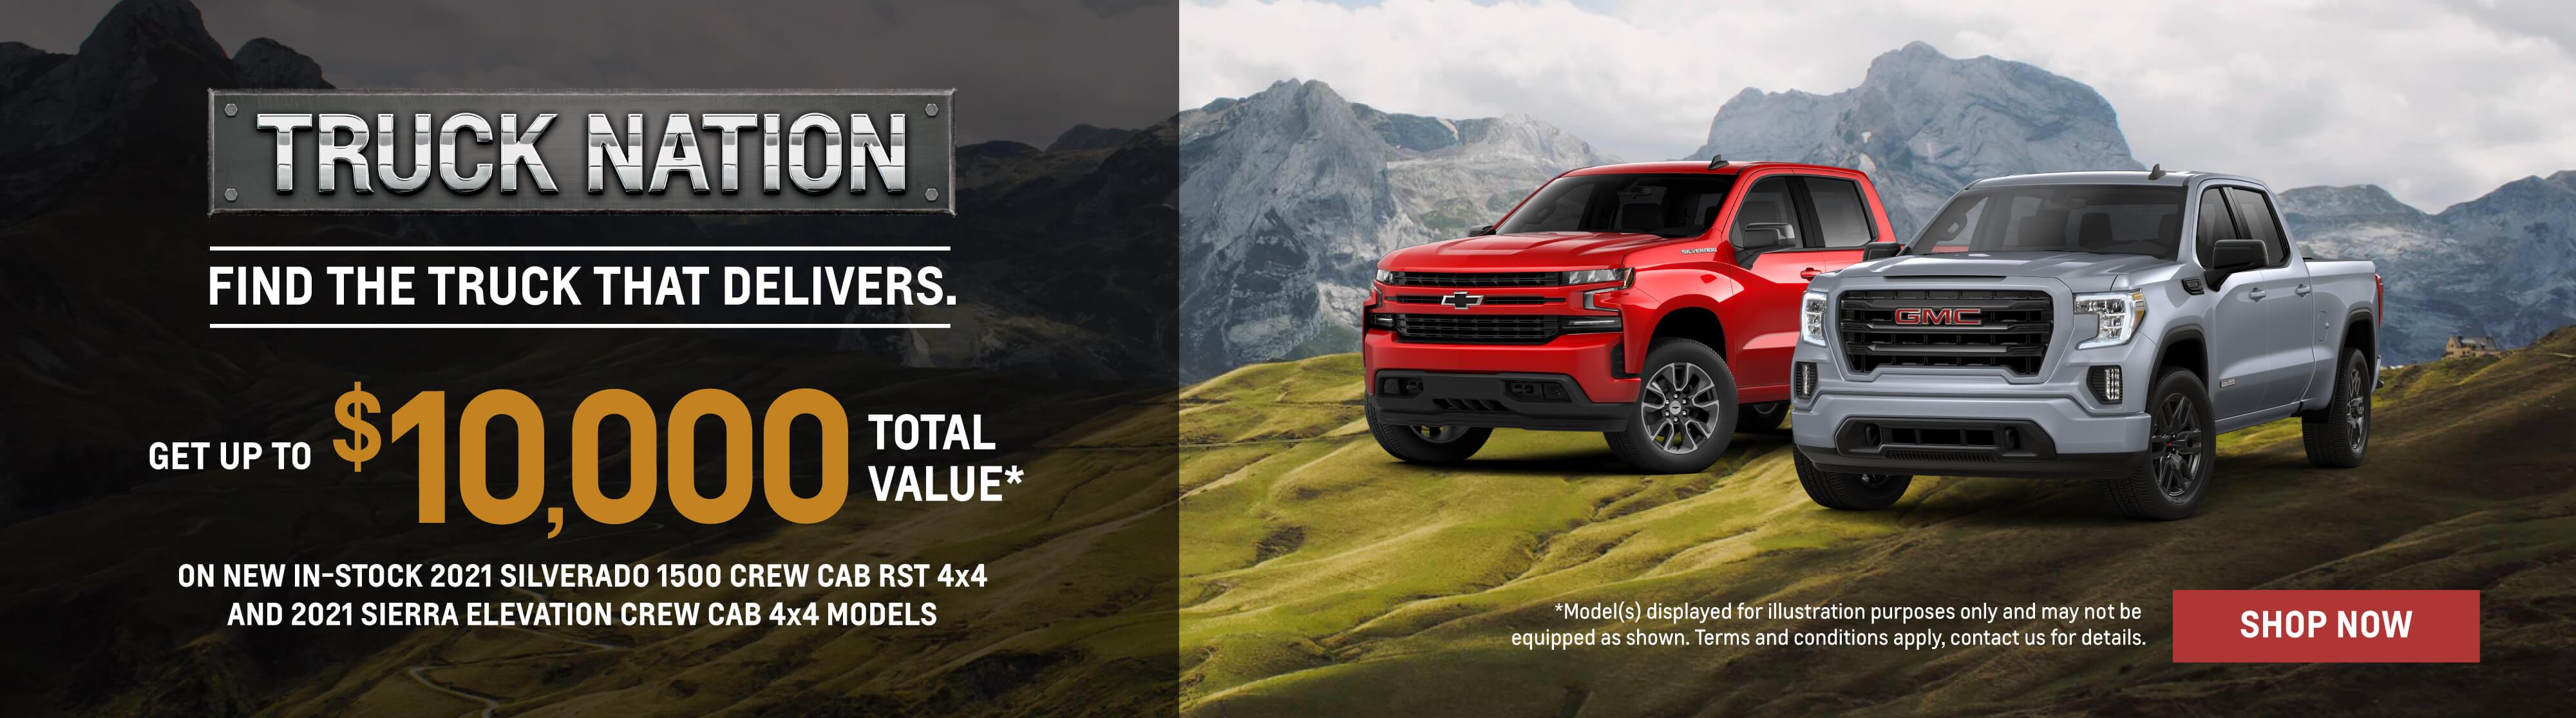 GM Truck Nation - City Buick Toronto